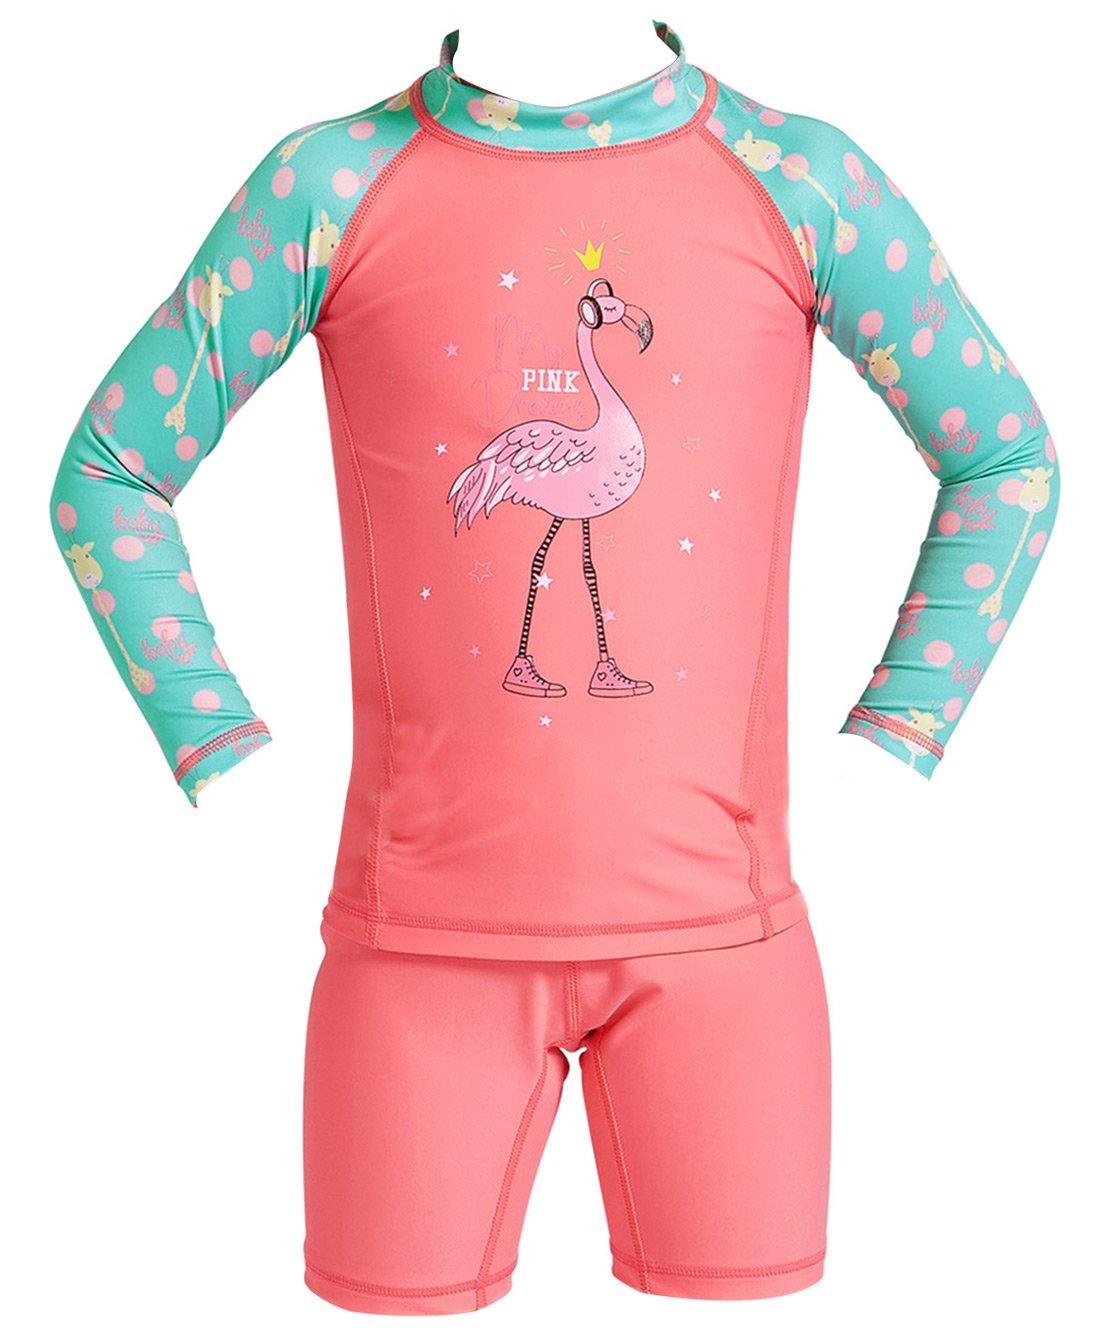 DIVE& SAIL Girls Long Sleeve Rashguard with Shorts Set 2-Piece Swimwear 4-9Y DIVE & SAIL